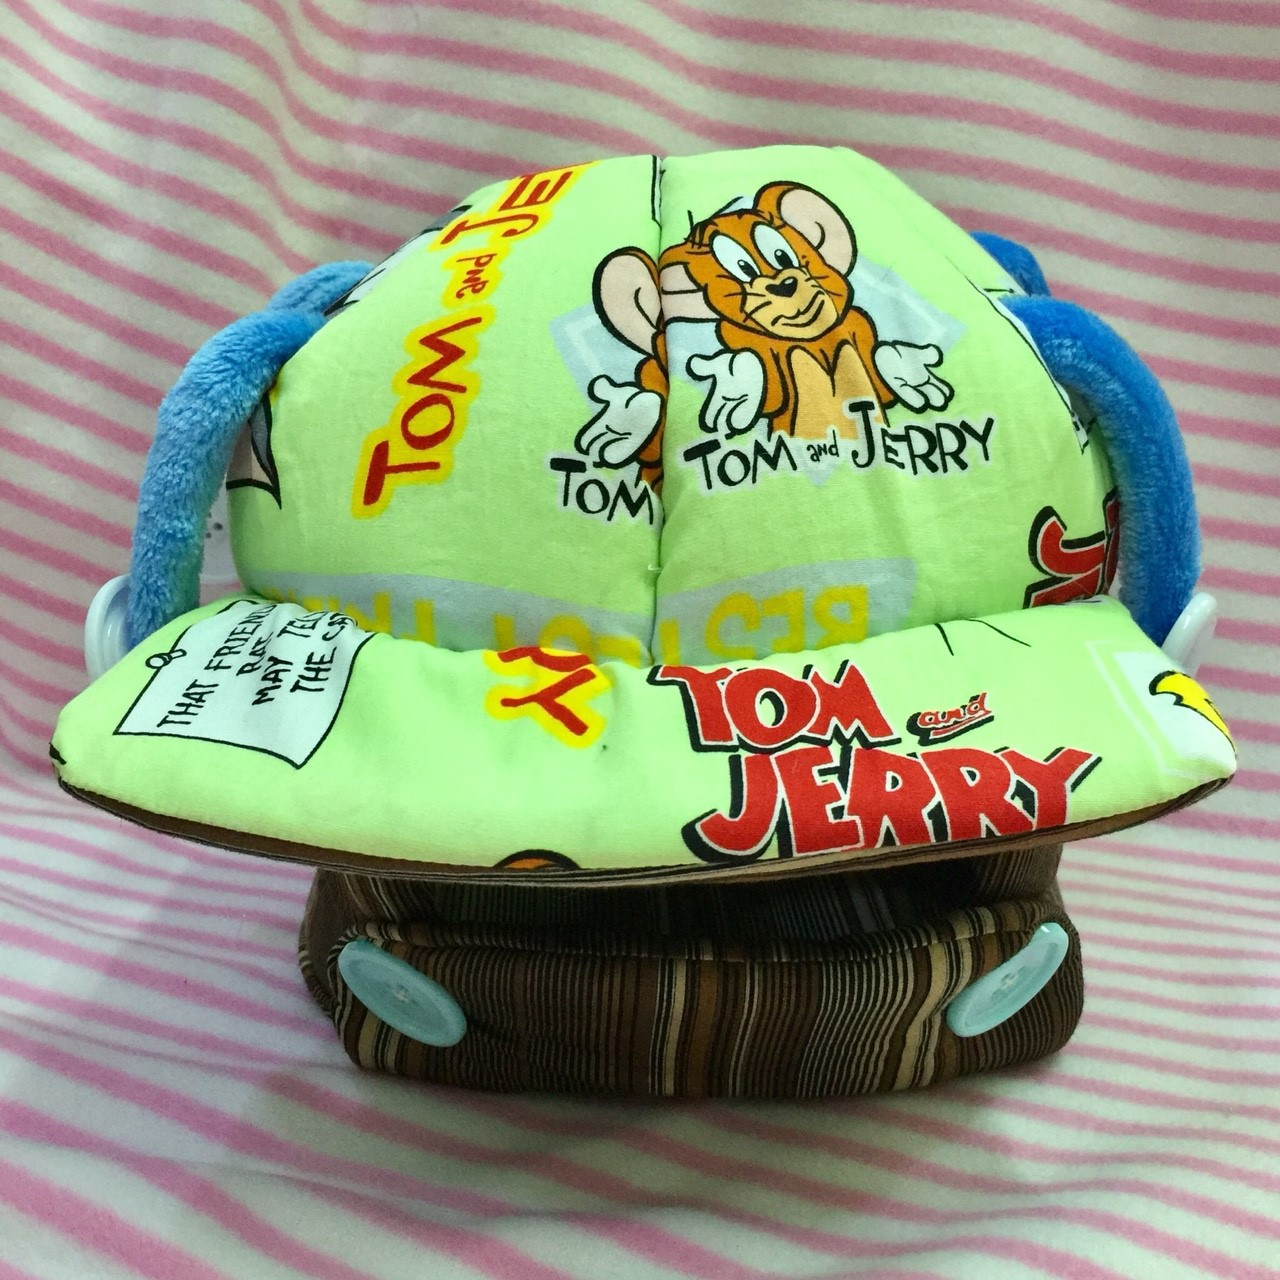 Spider บ้านหมวกแคป 8 นิ้ว ทอม&เจอรี่